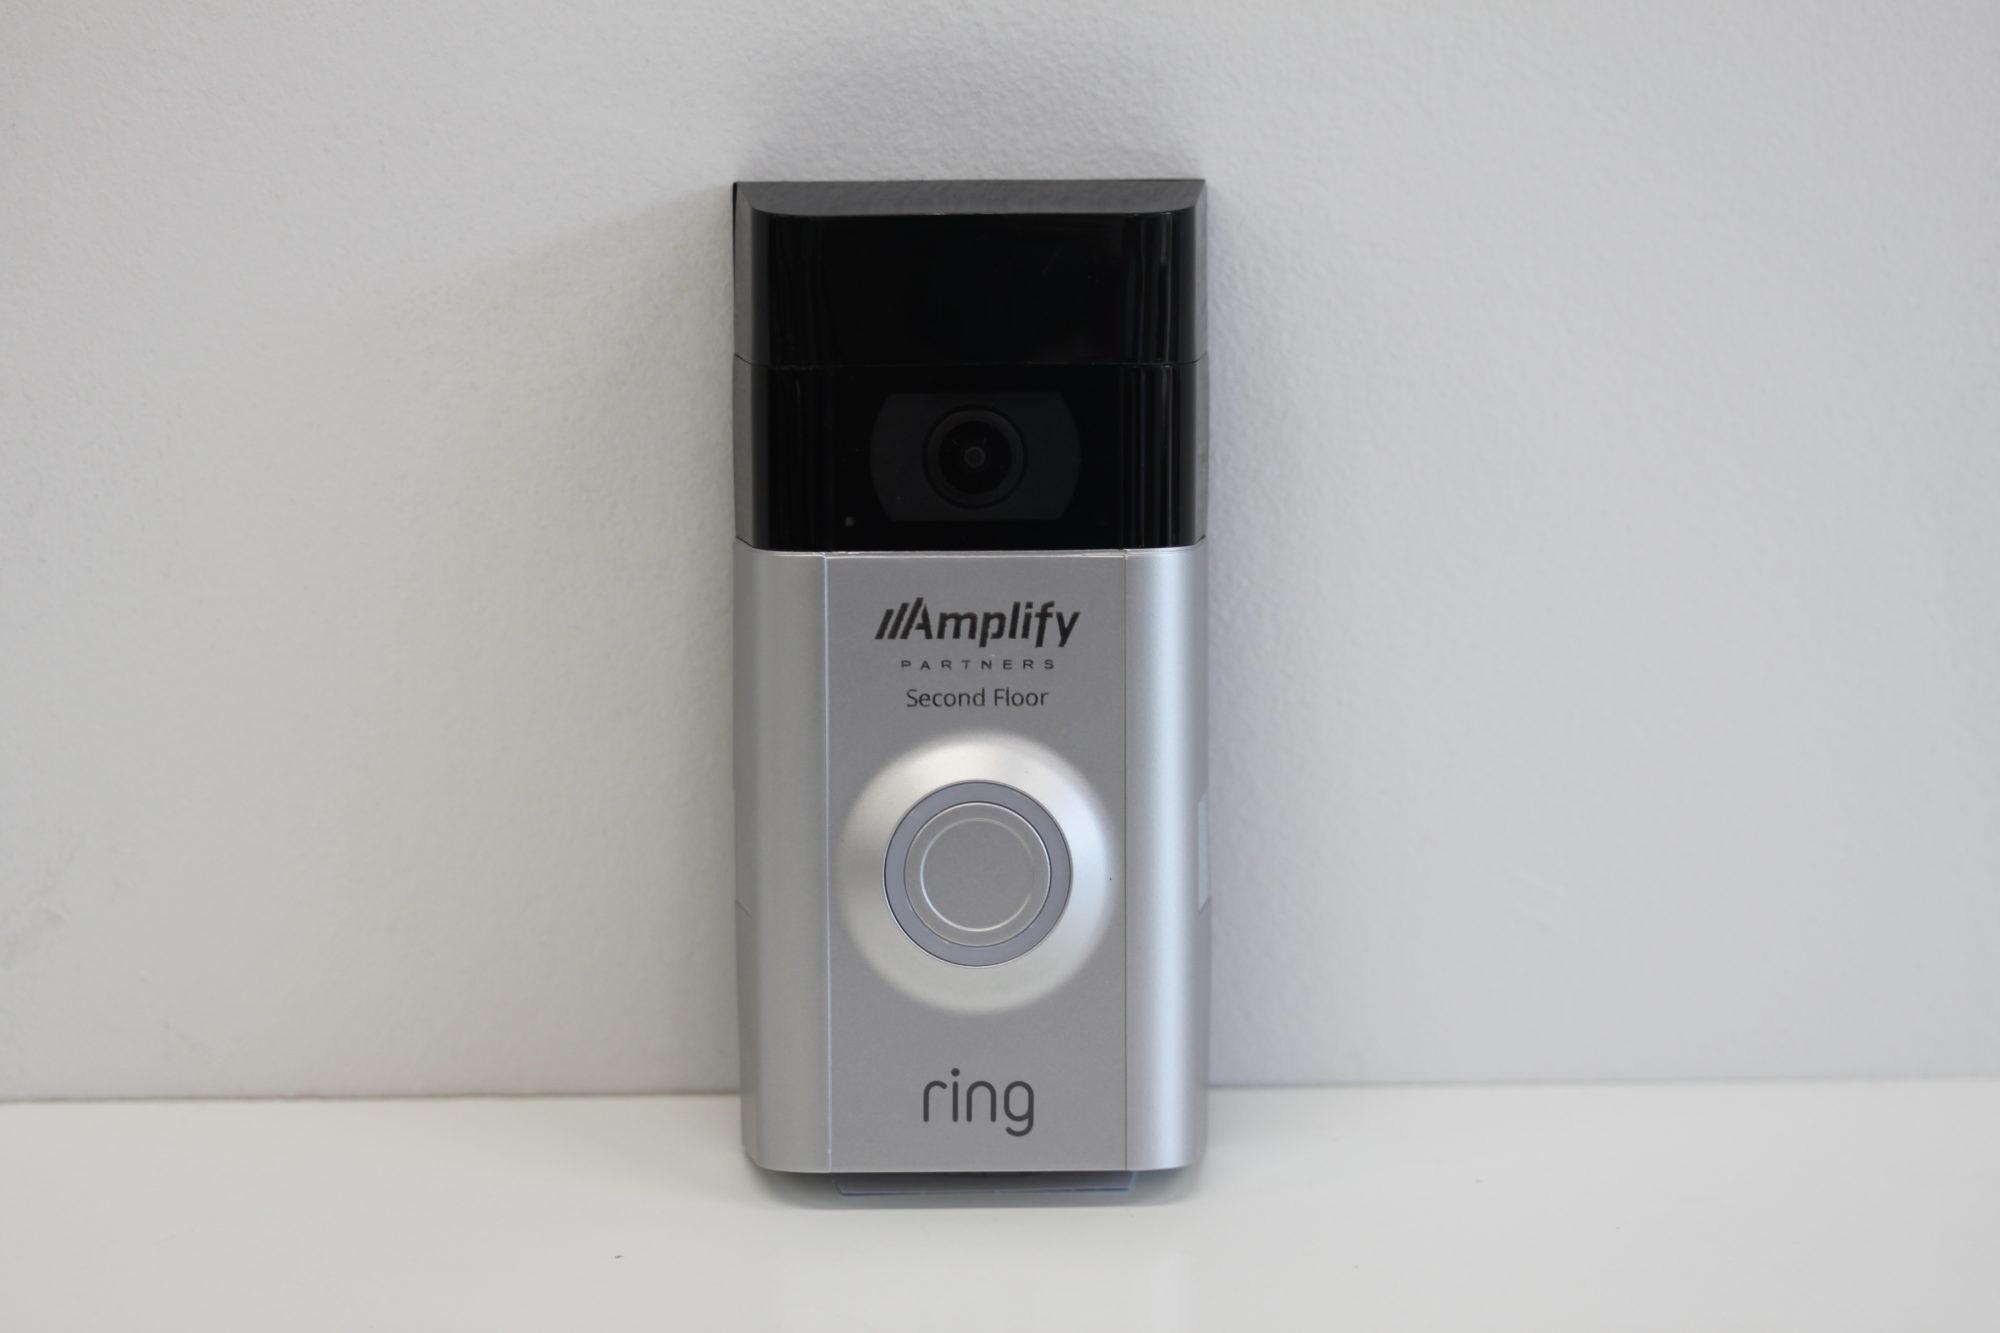 Customized ring doorbell